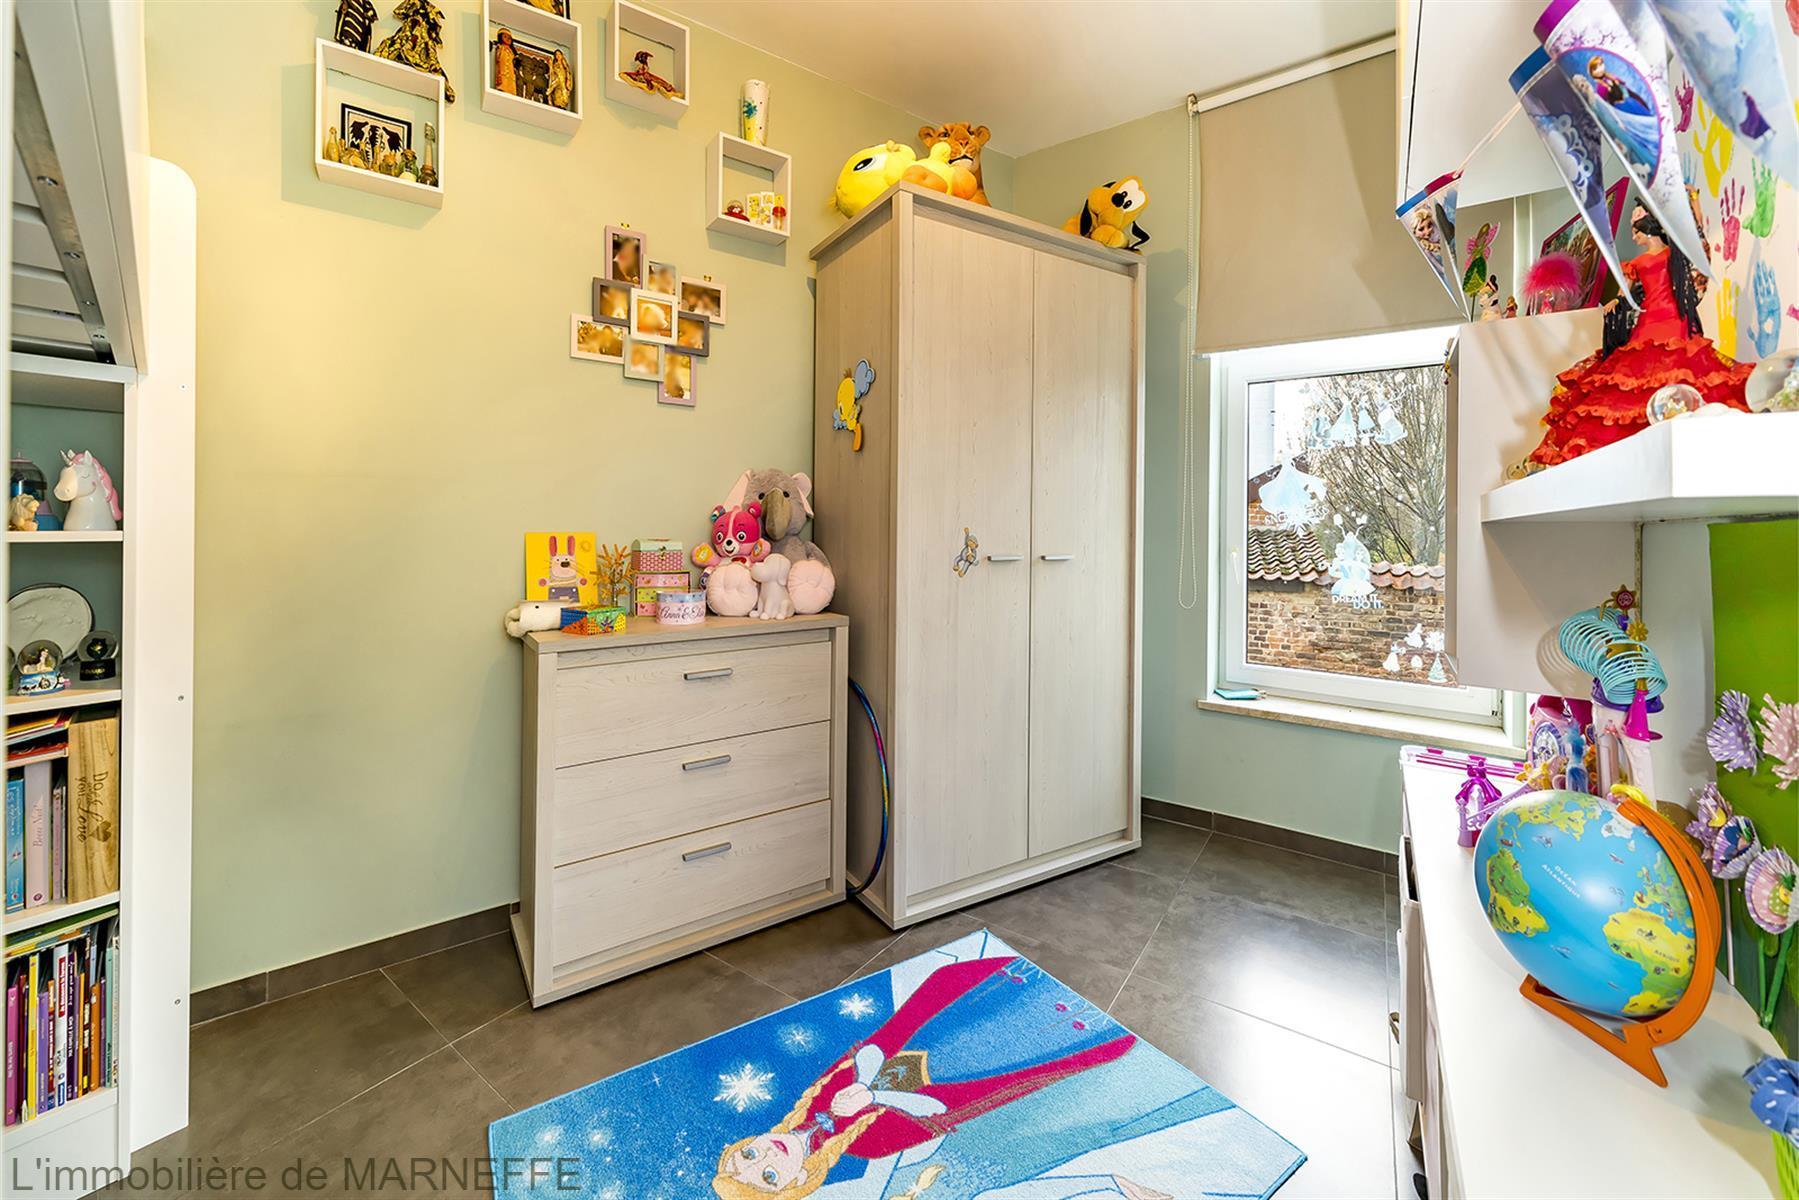 Appartement avec jardin - Orp-Jauche - #3625402-13